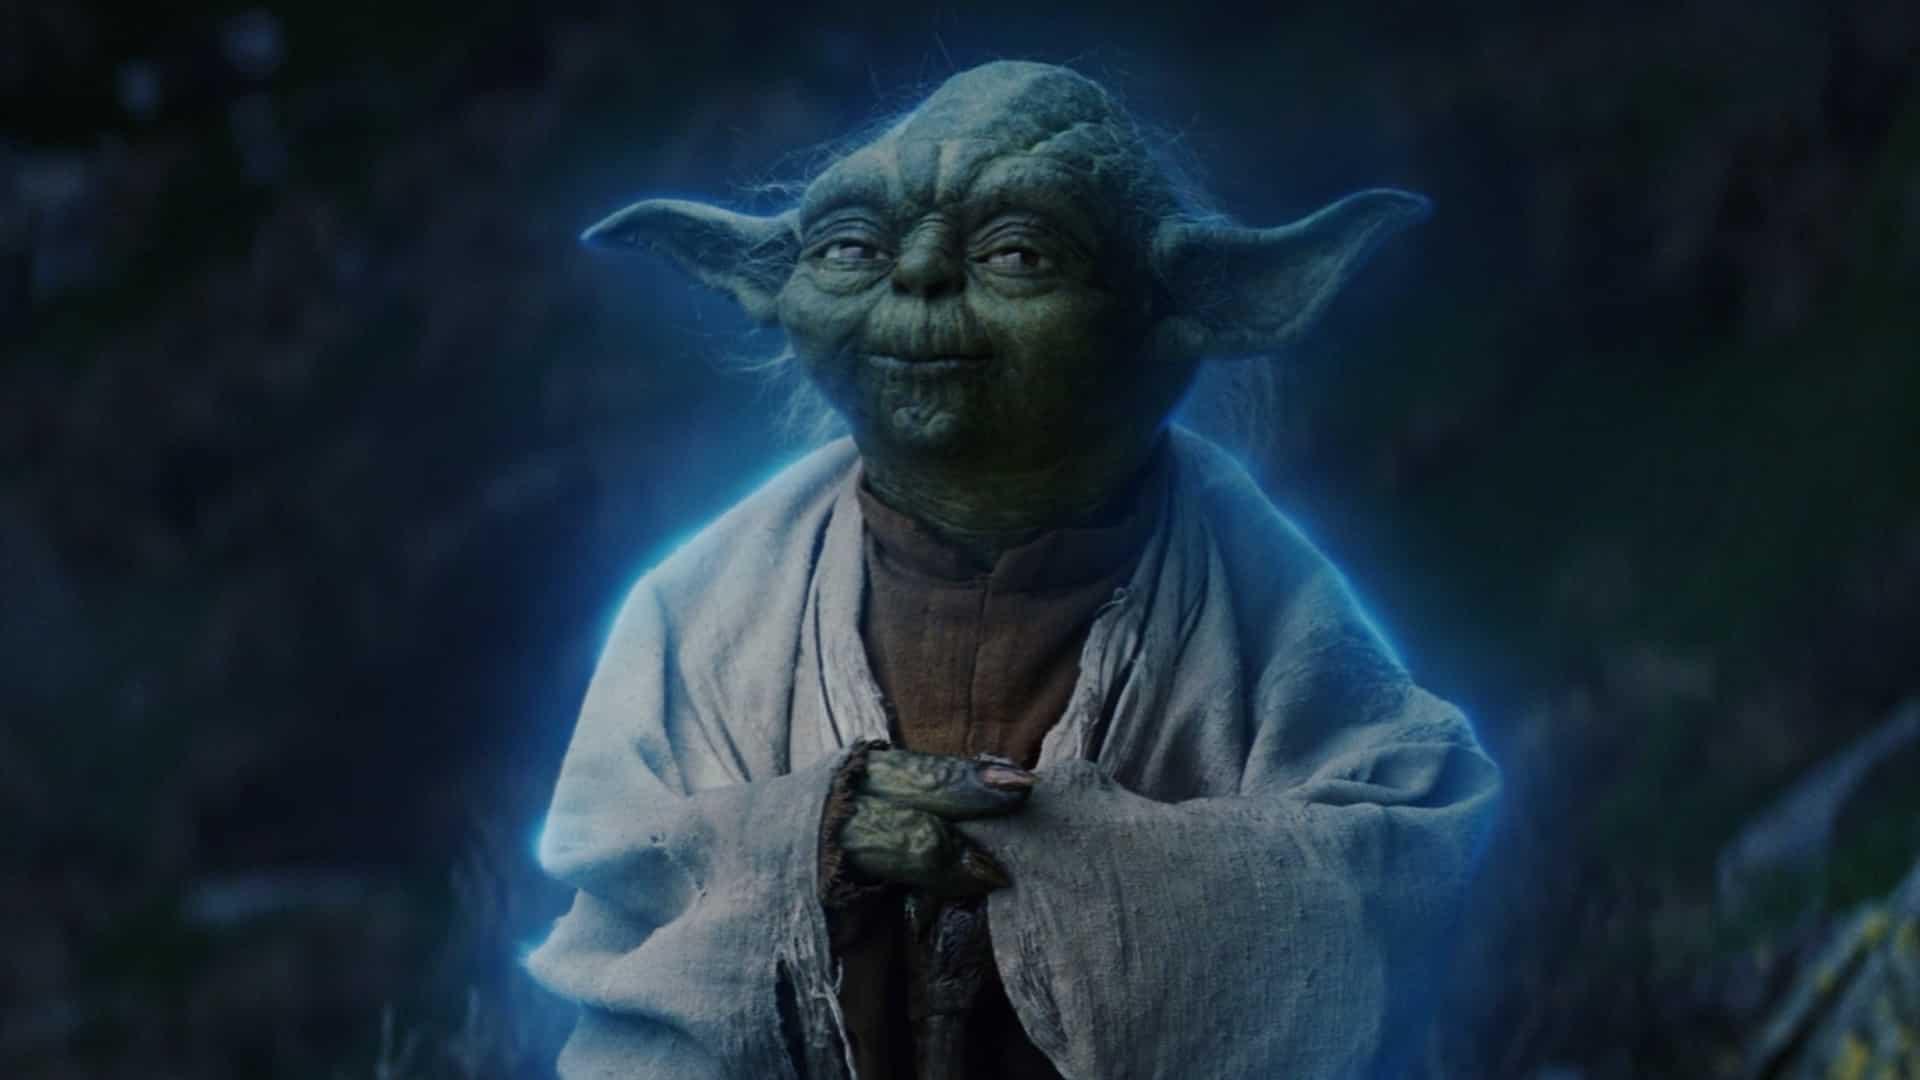 Film Star Wars 9 yoda